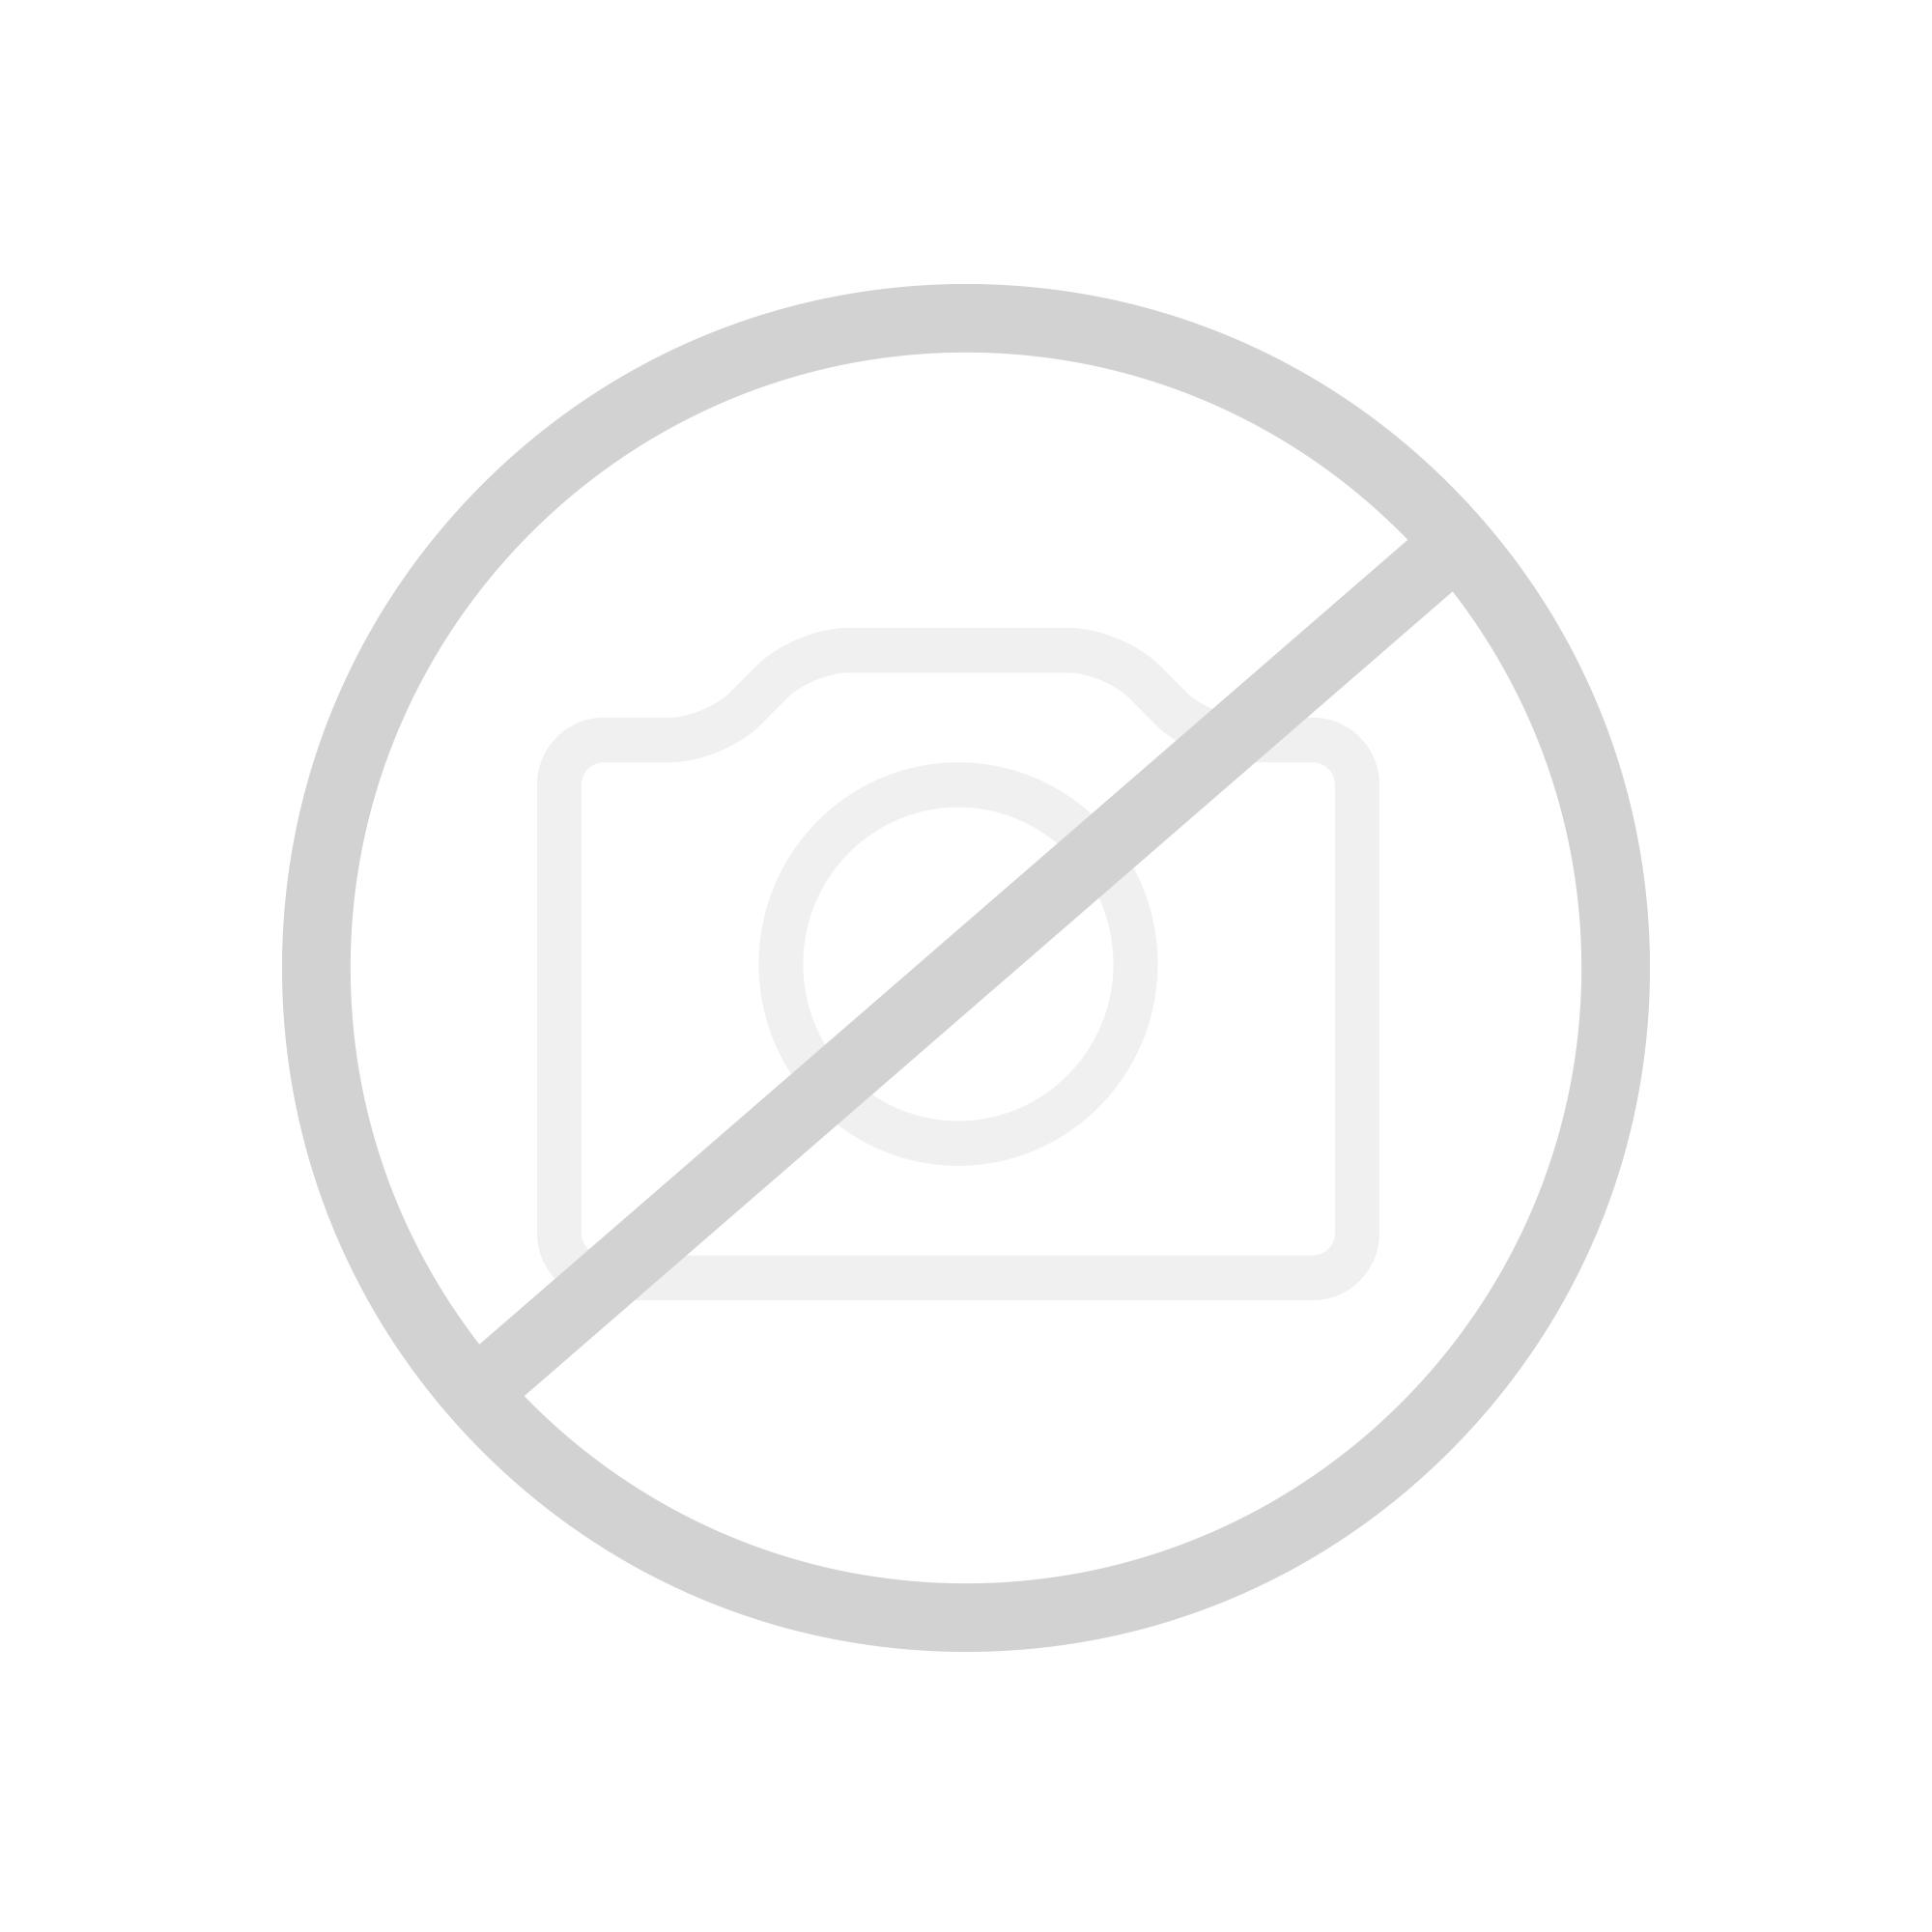 Dornbracht Madison Badetuchhalter chrom